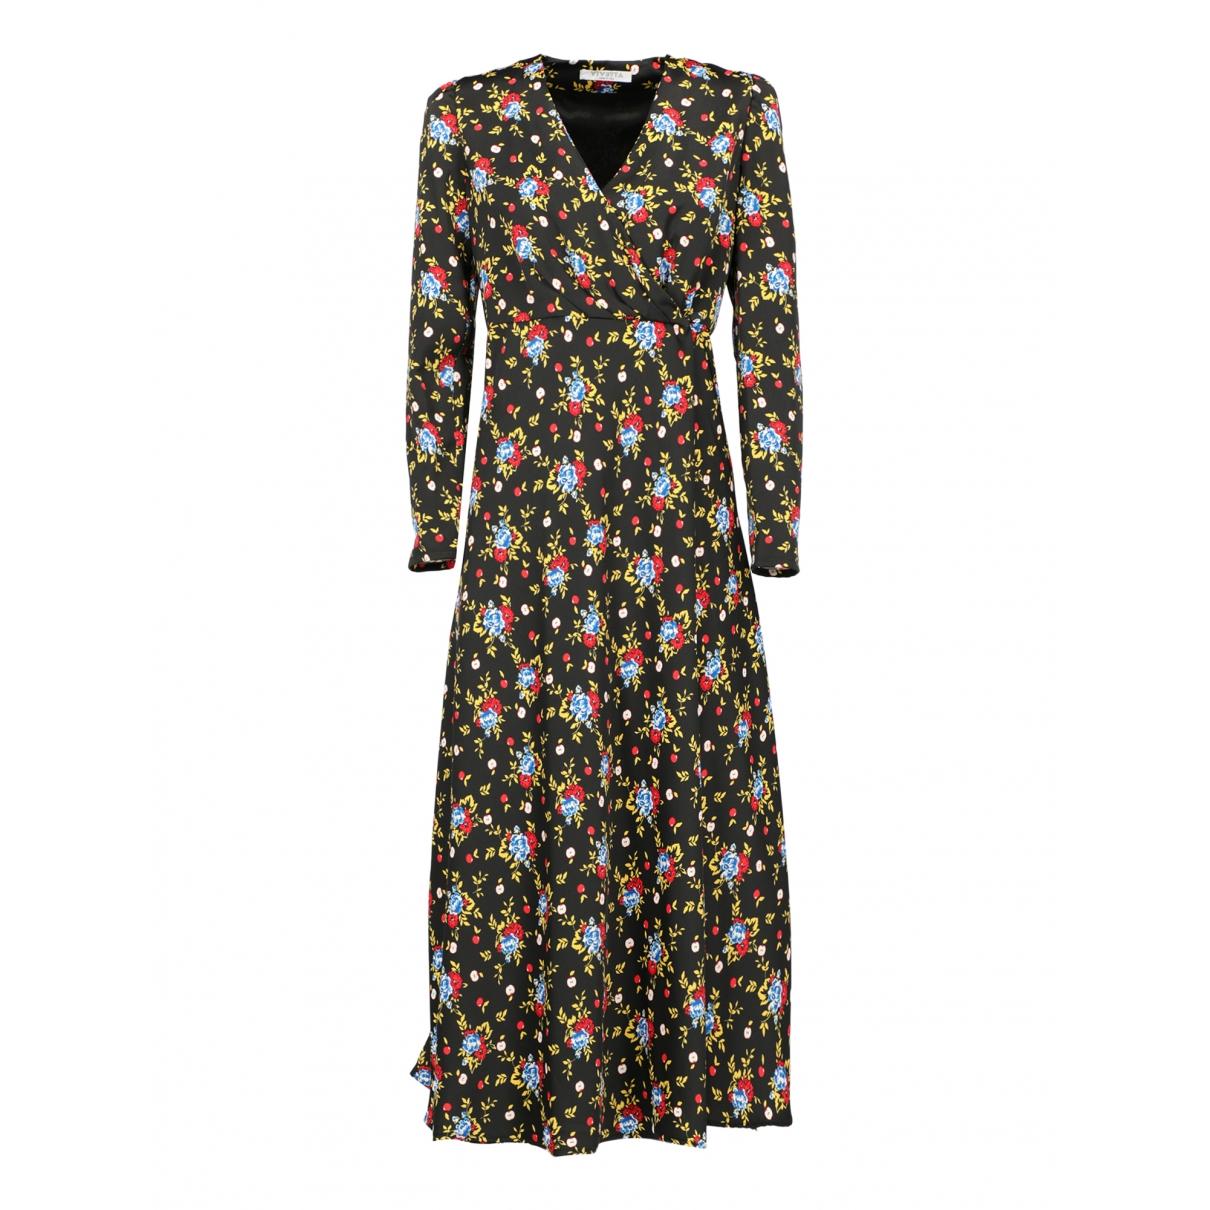 Vivetta \N Kleid in  Schwarz Synthetik